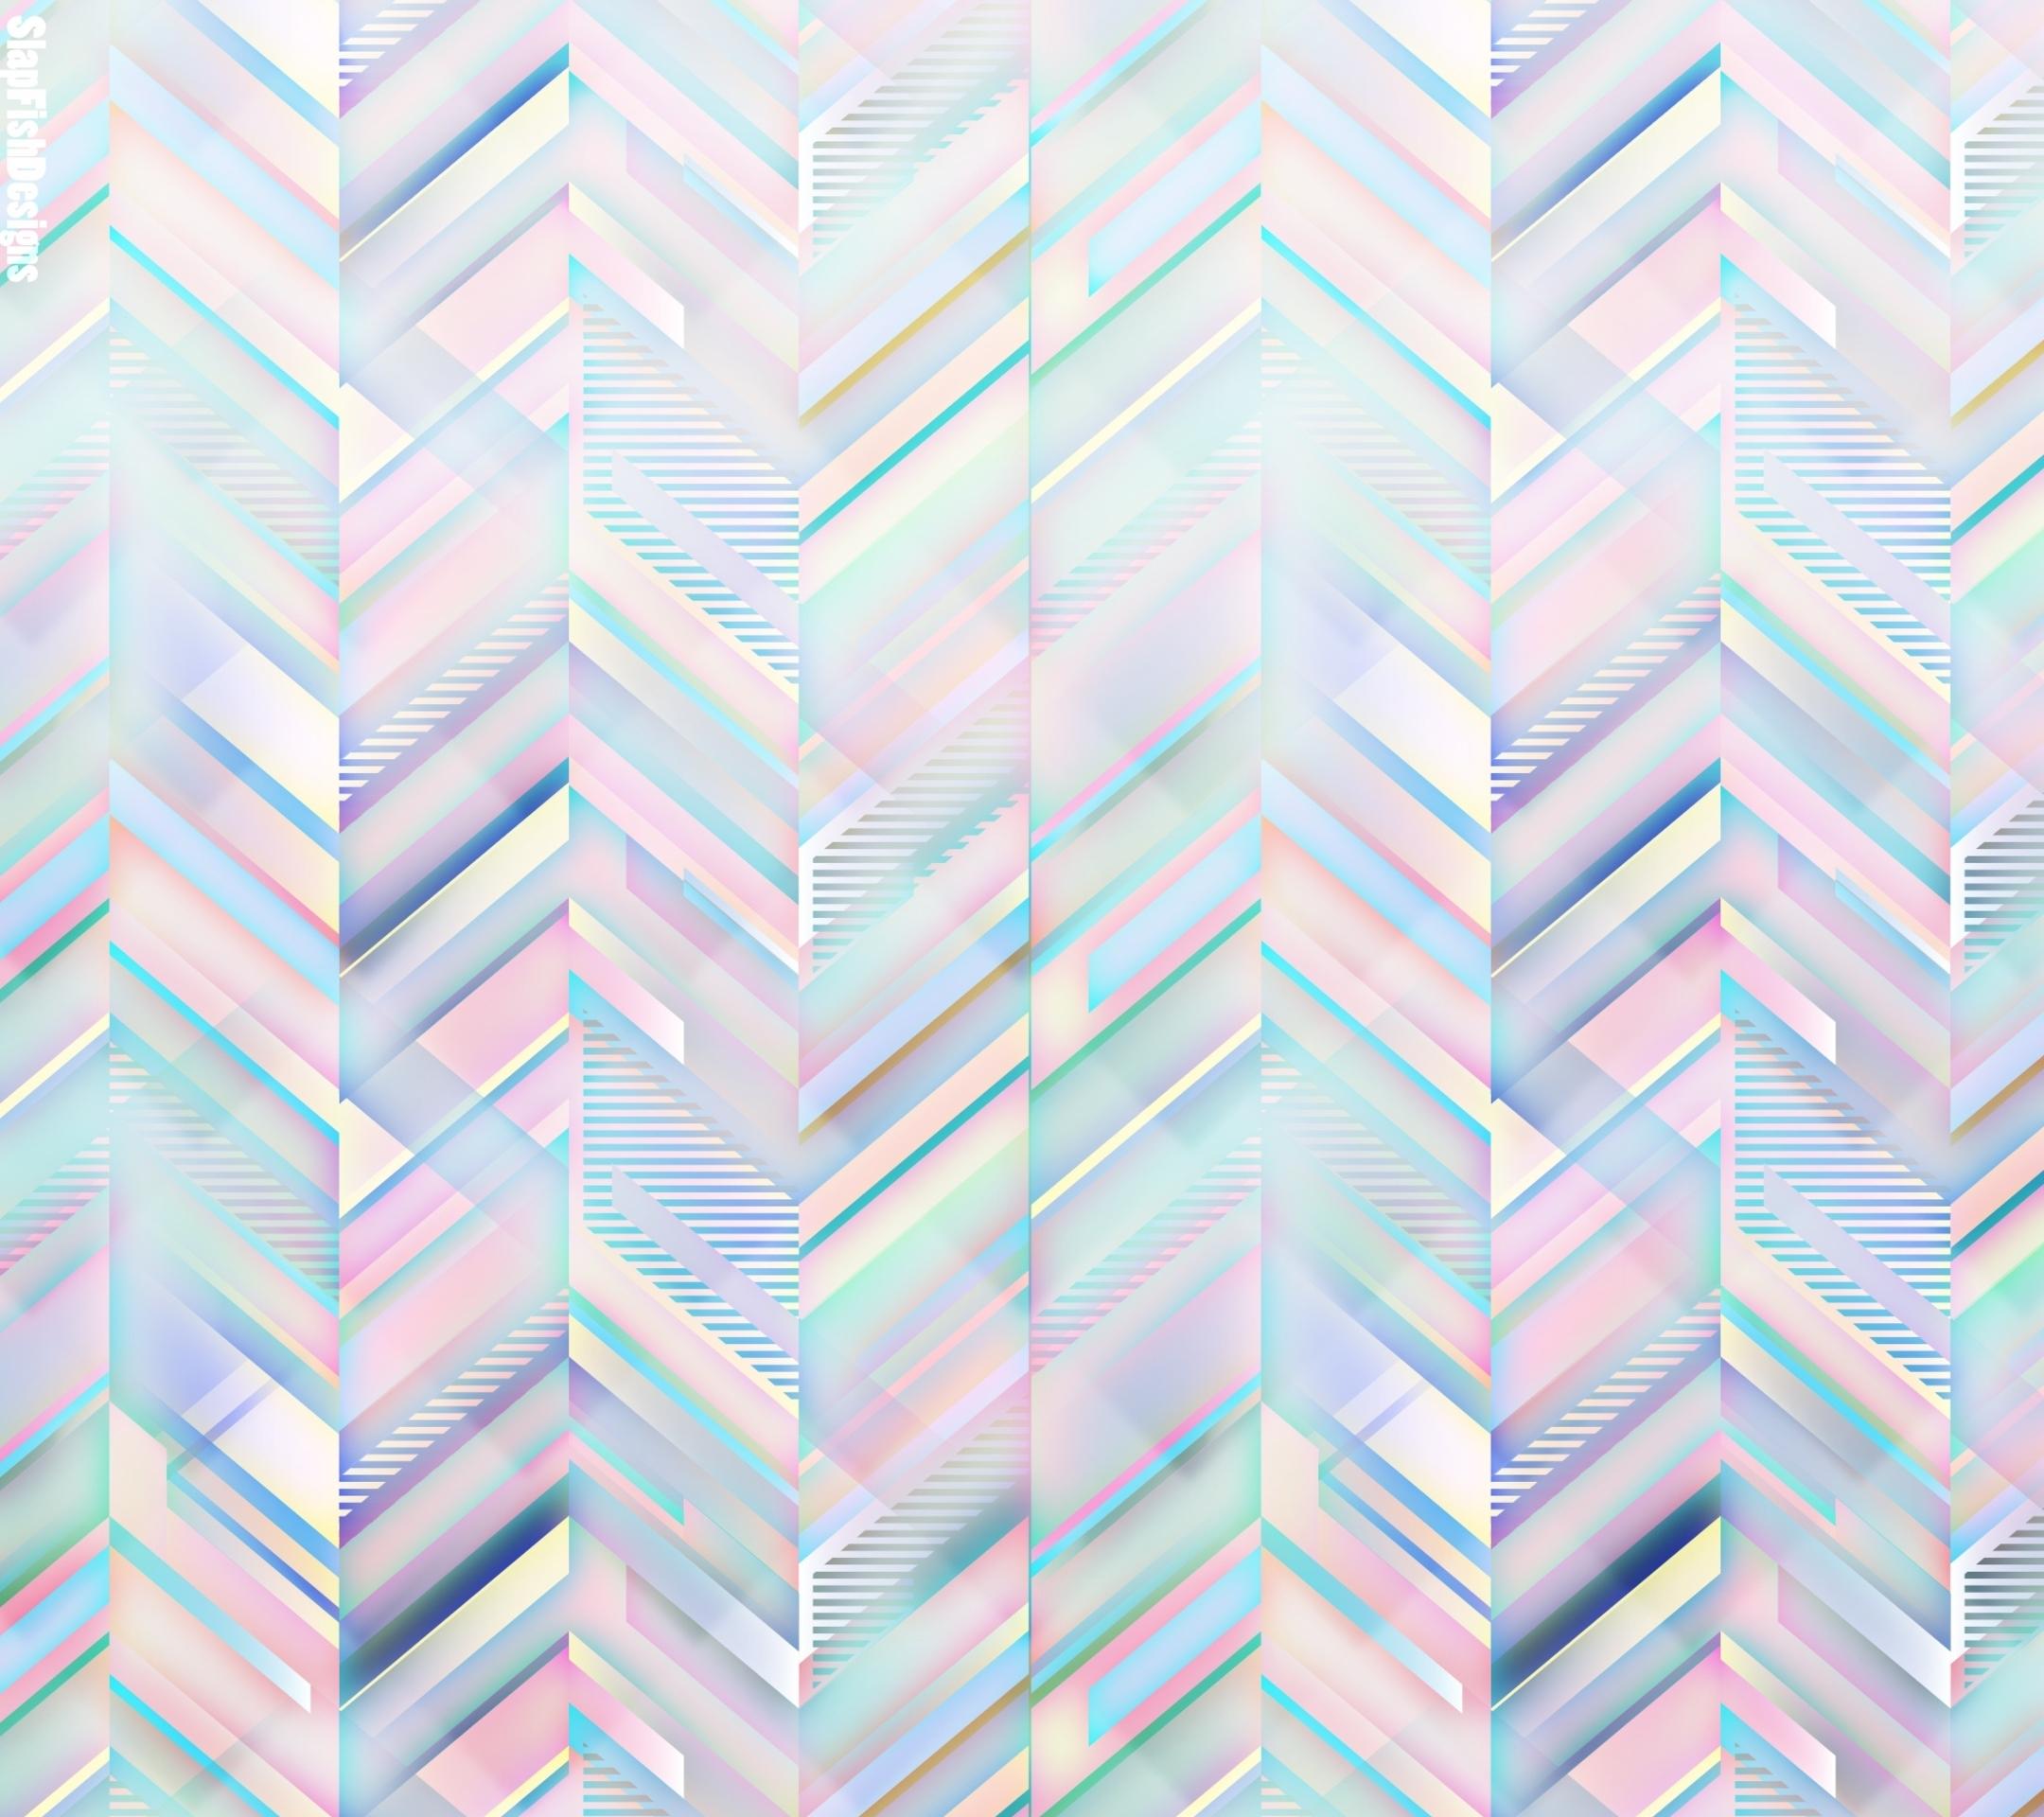 gallery 11 patterns my galaxy s4 wallpaper hd patterns 79 jpg 2160x1920